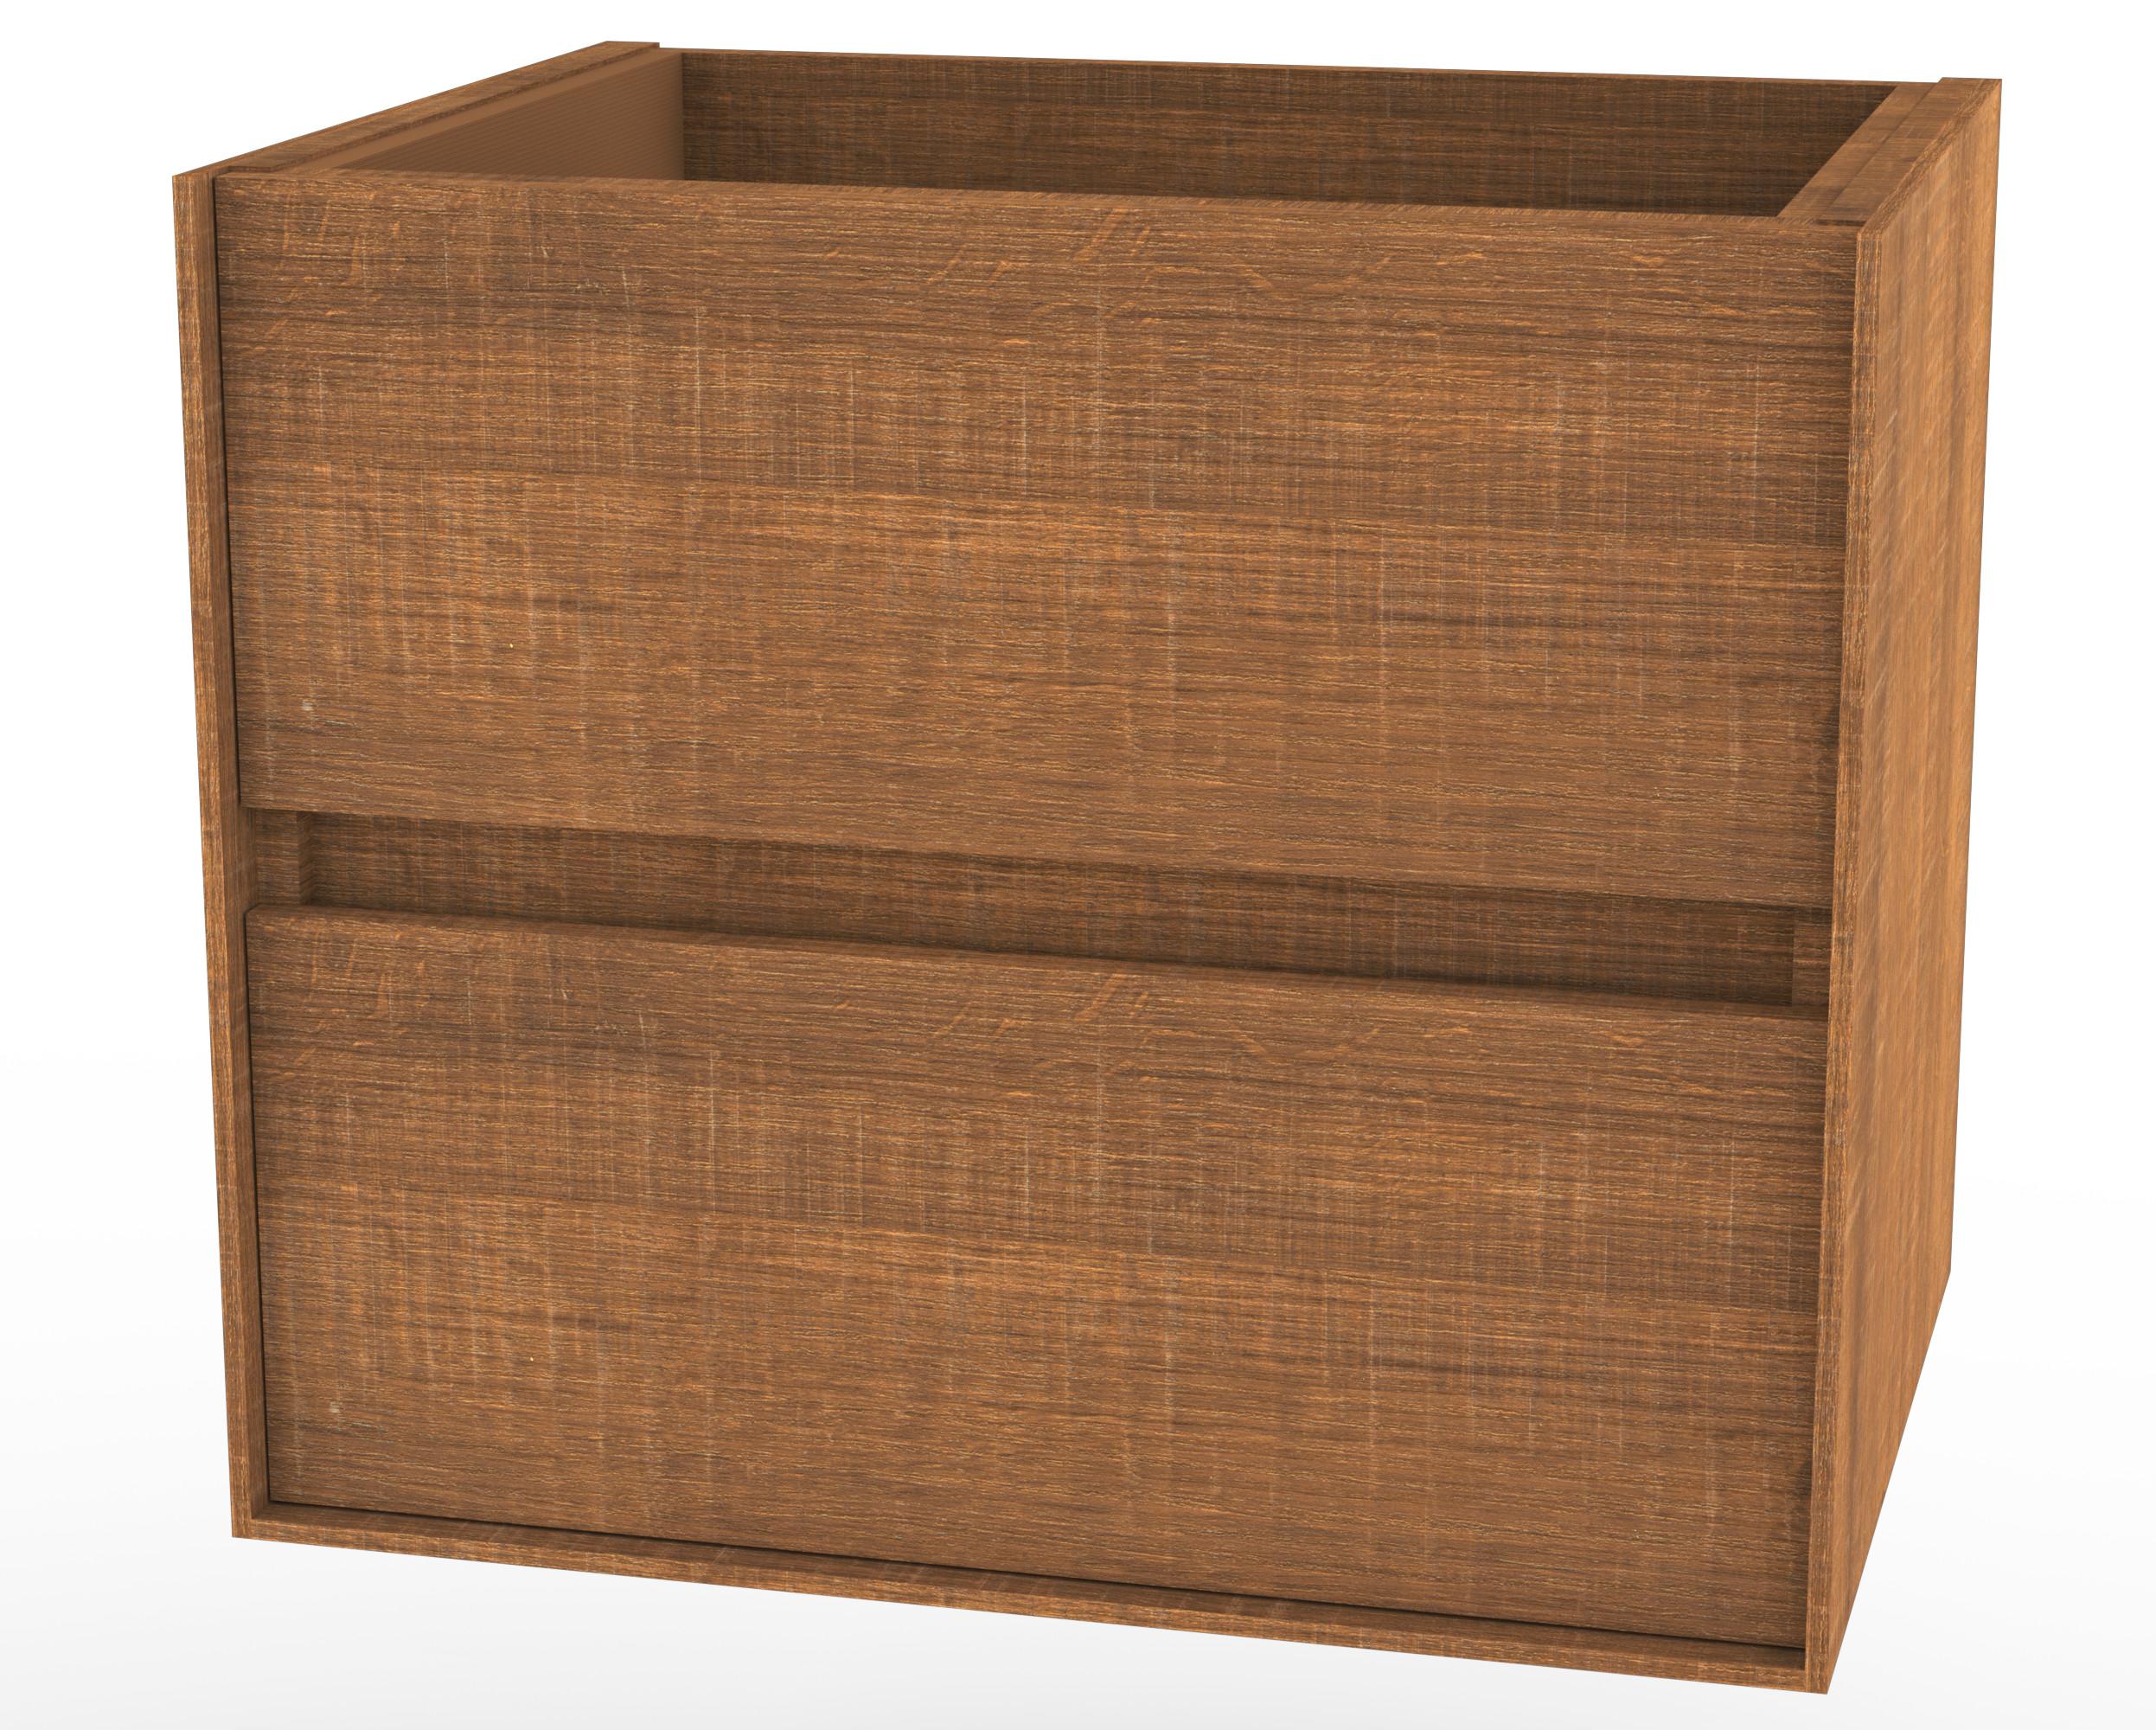 60x46 CmBrown Pescara Oak Wastafelonderkast 5820090859 Wavedesign sdQCrxth